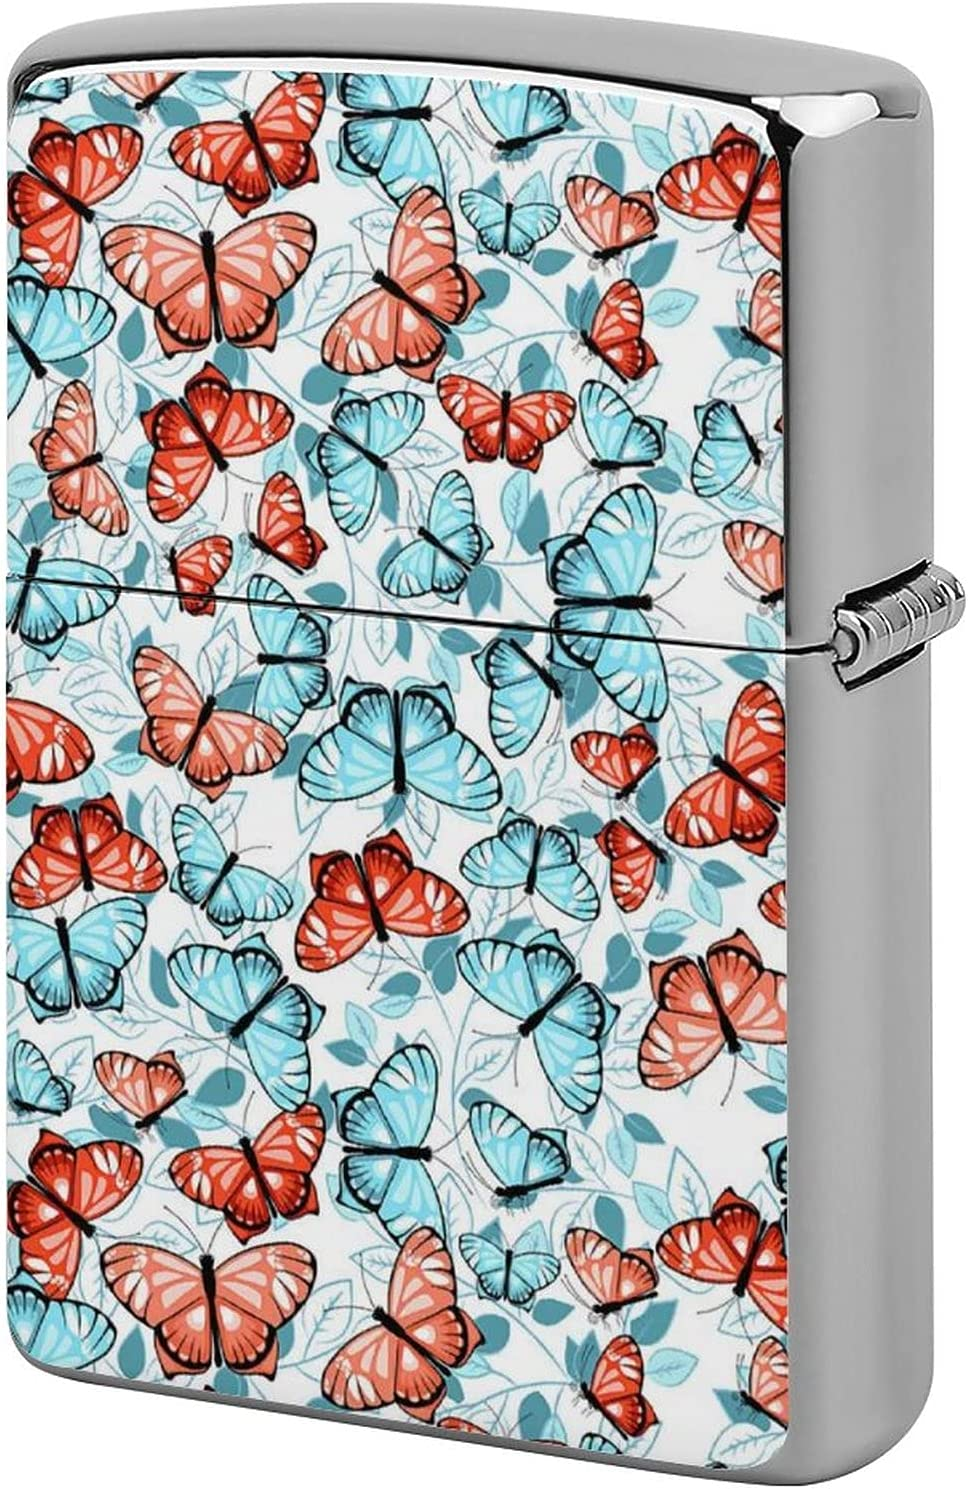 Lighter Large discharge sale Case Blue Butterflies Big Butterfly Ho Dome Elegant Half